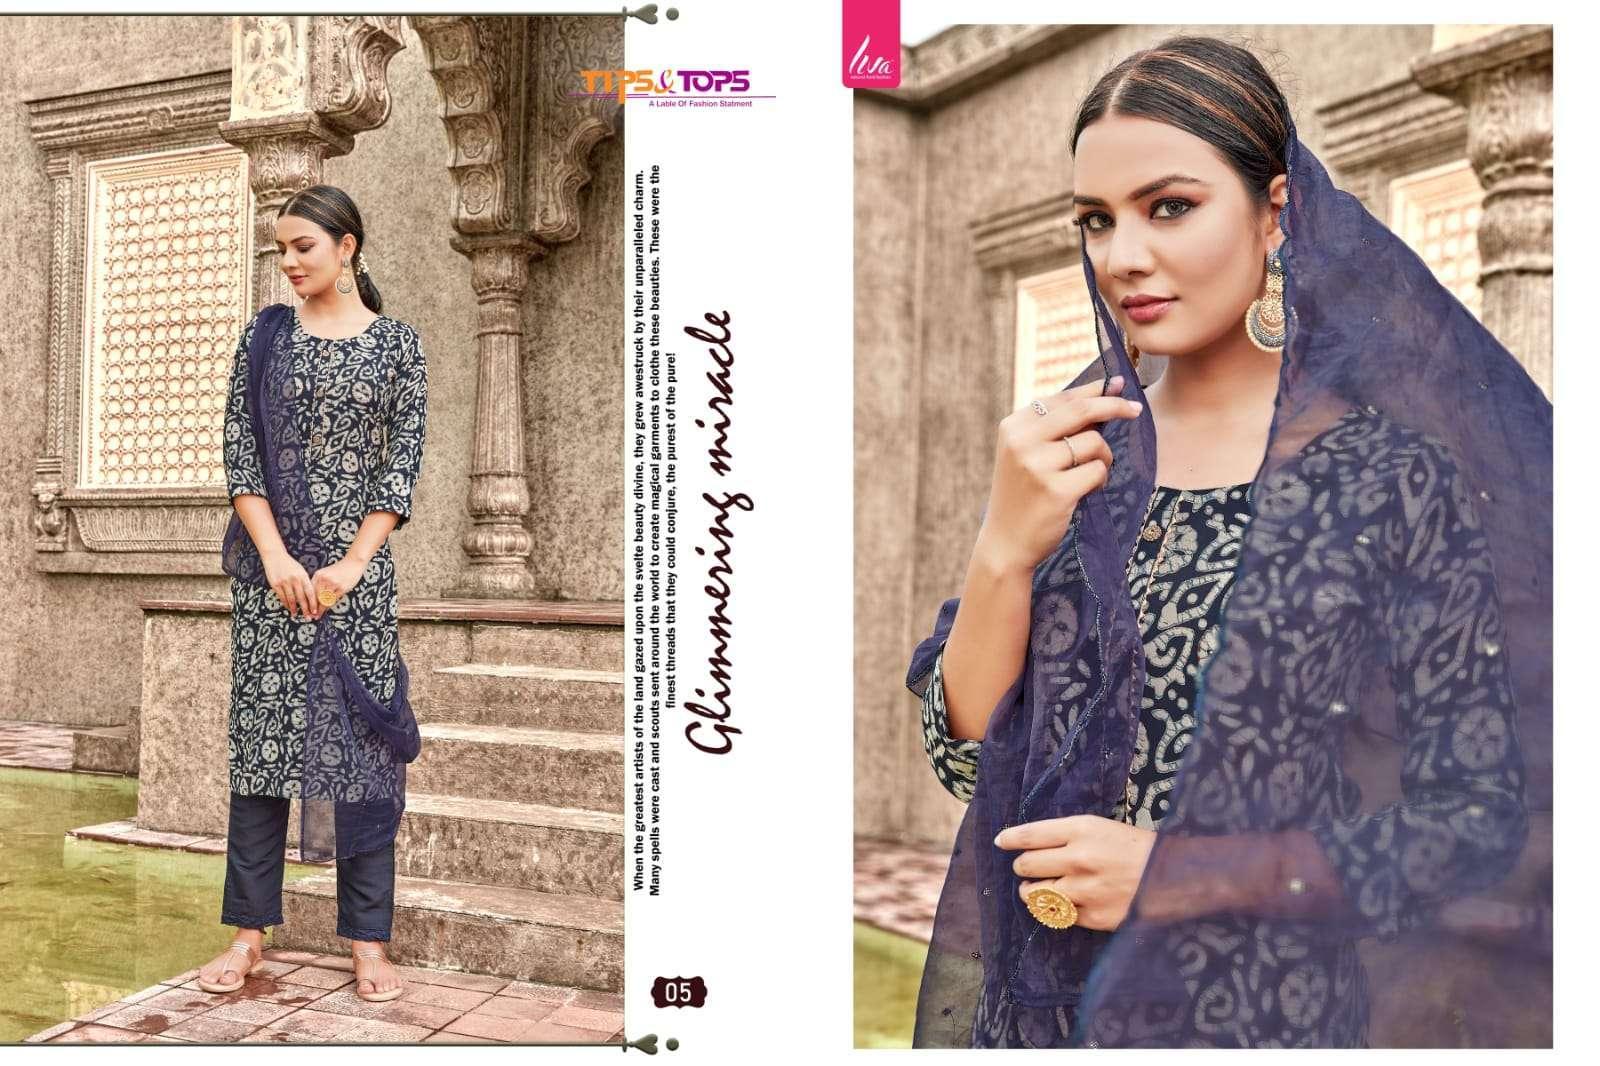 tips & tops batik vol 1 series 01-06 Heavy Muslin Batik Foil Print suit